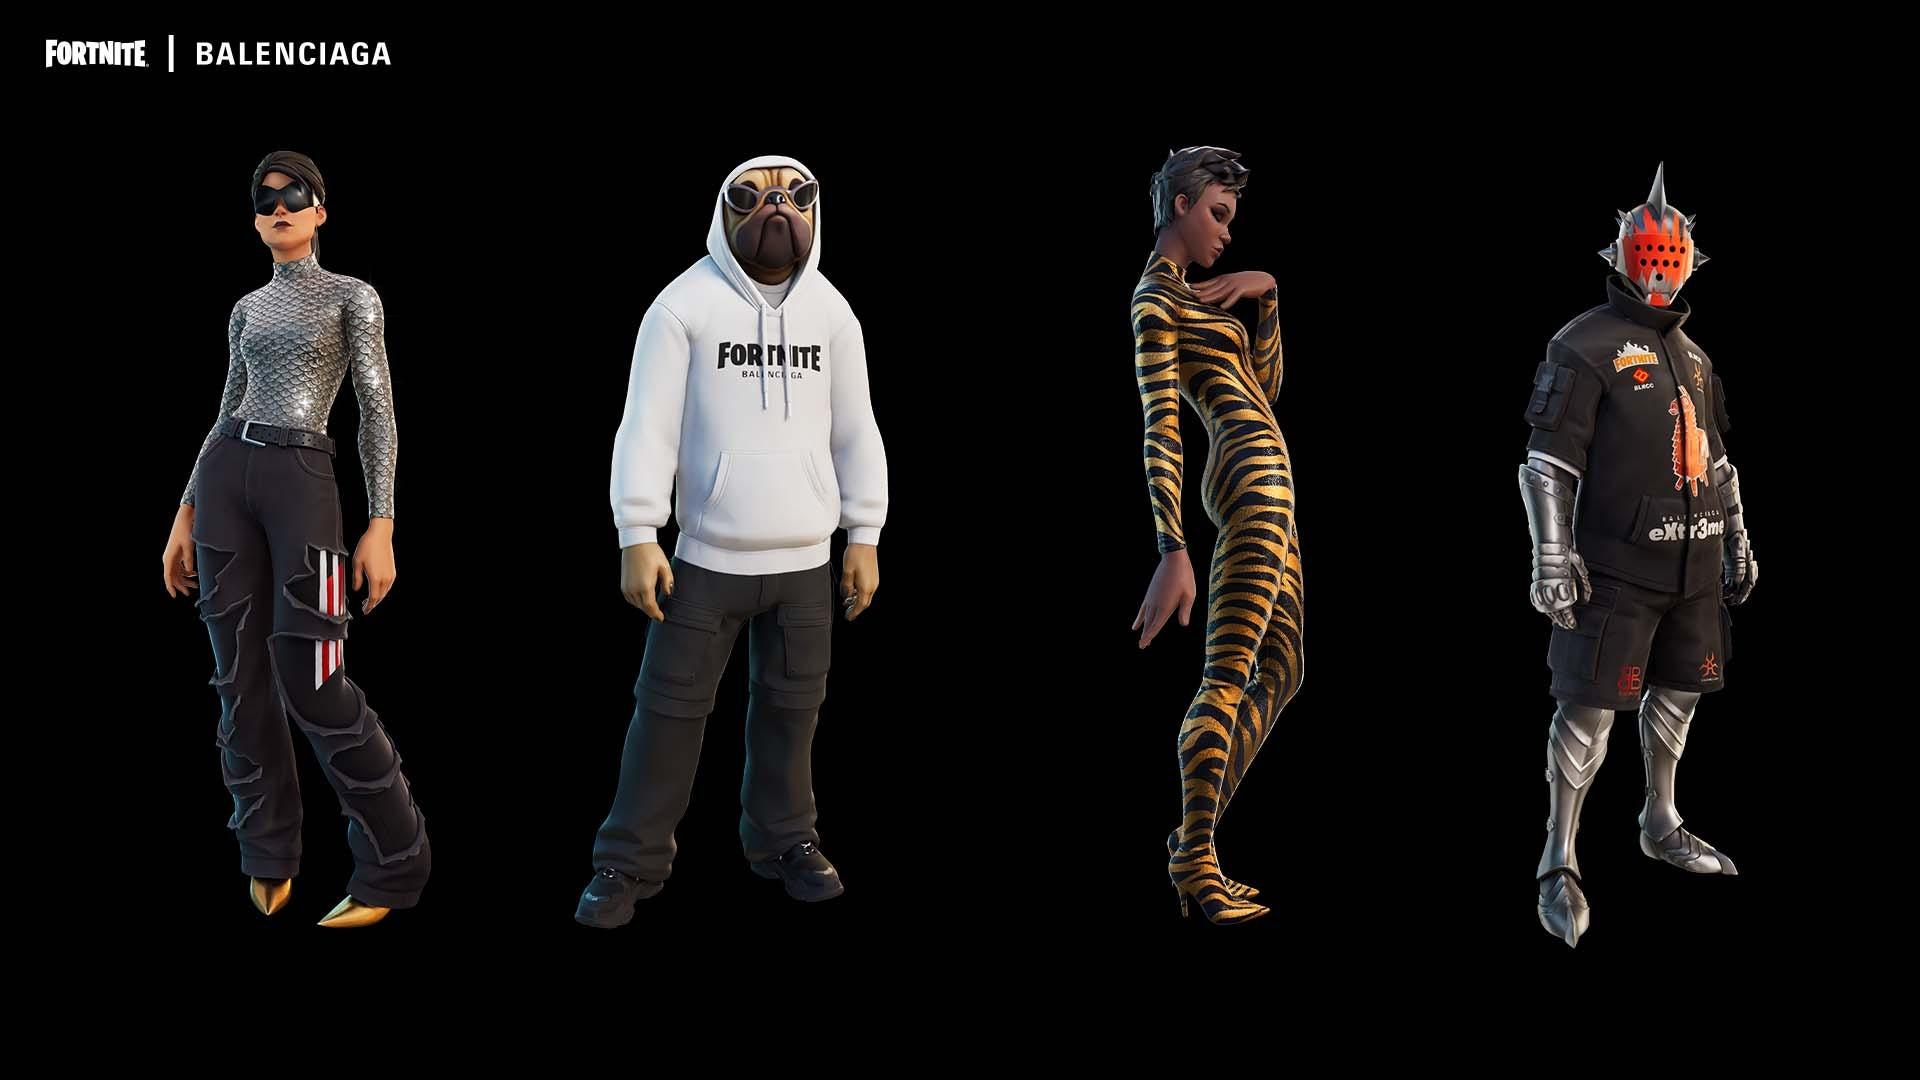 Fortnite characters Ramirez, Doggo, Banshee, and Knight in their Balenciaga outfits. Fortnite.